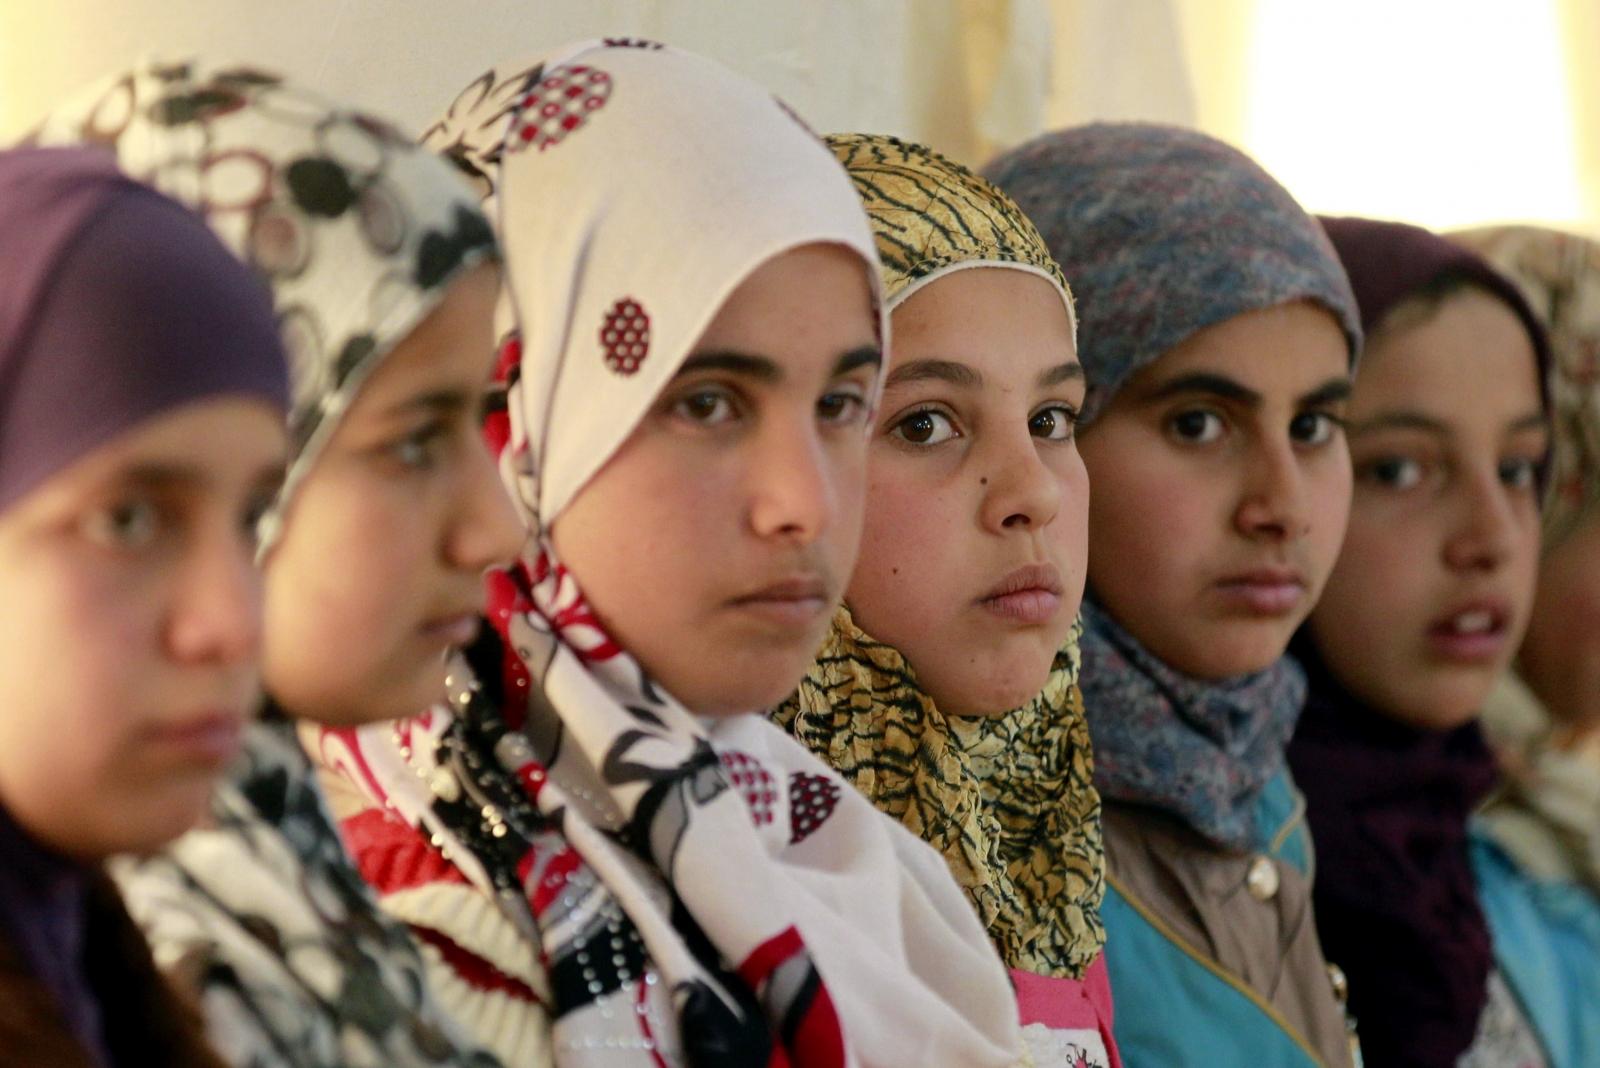 female refugees